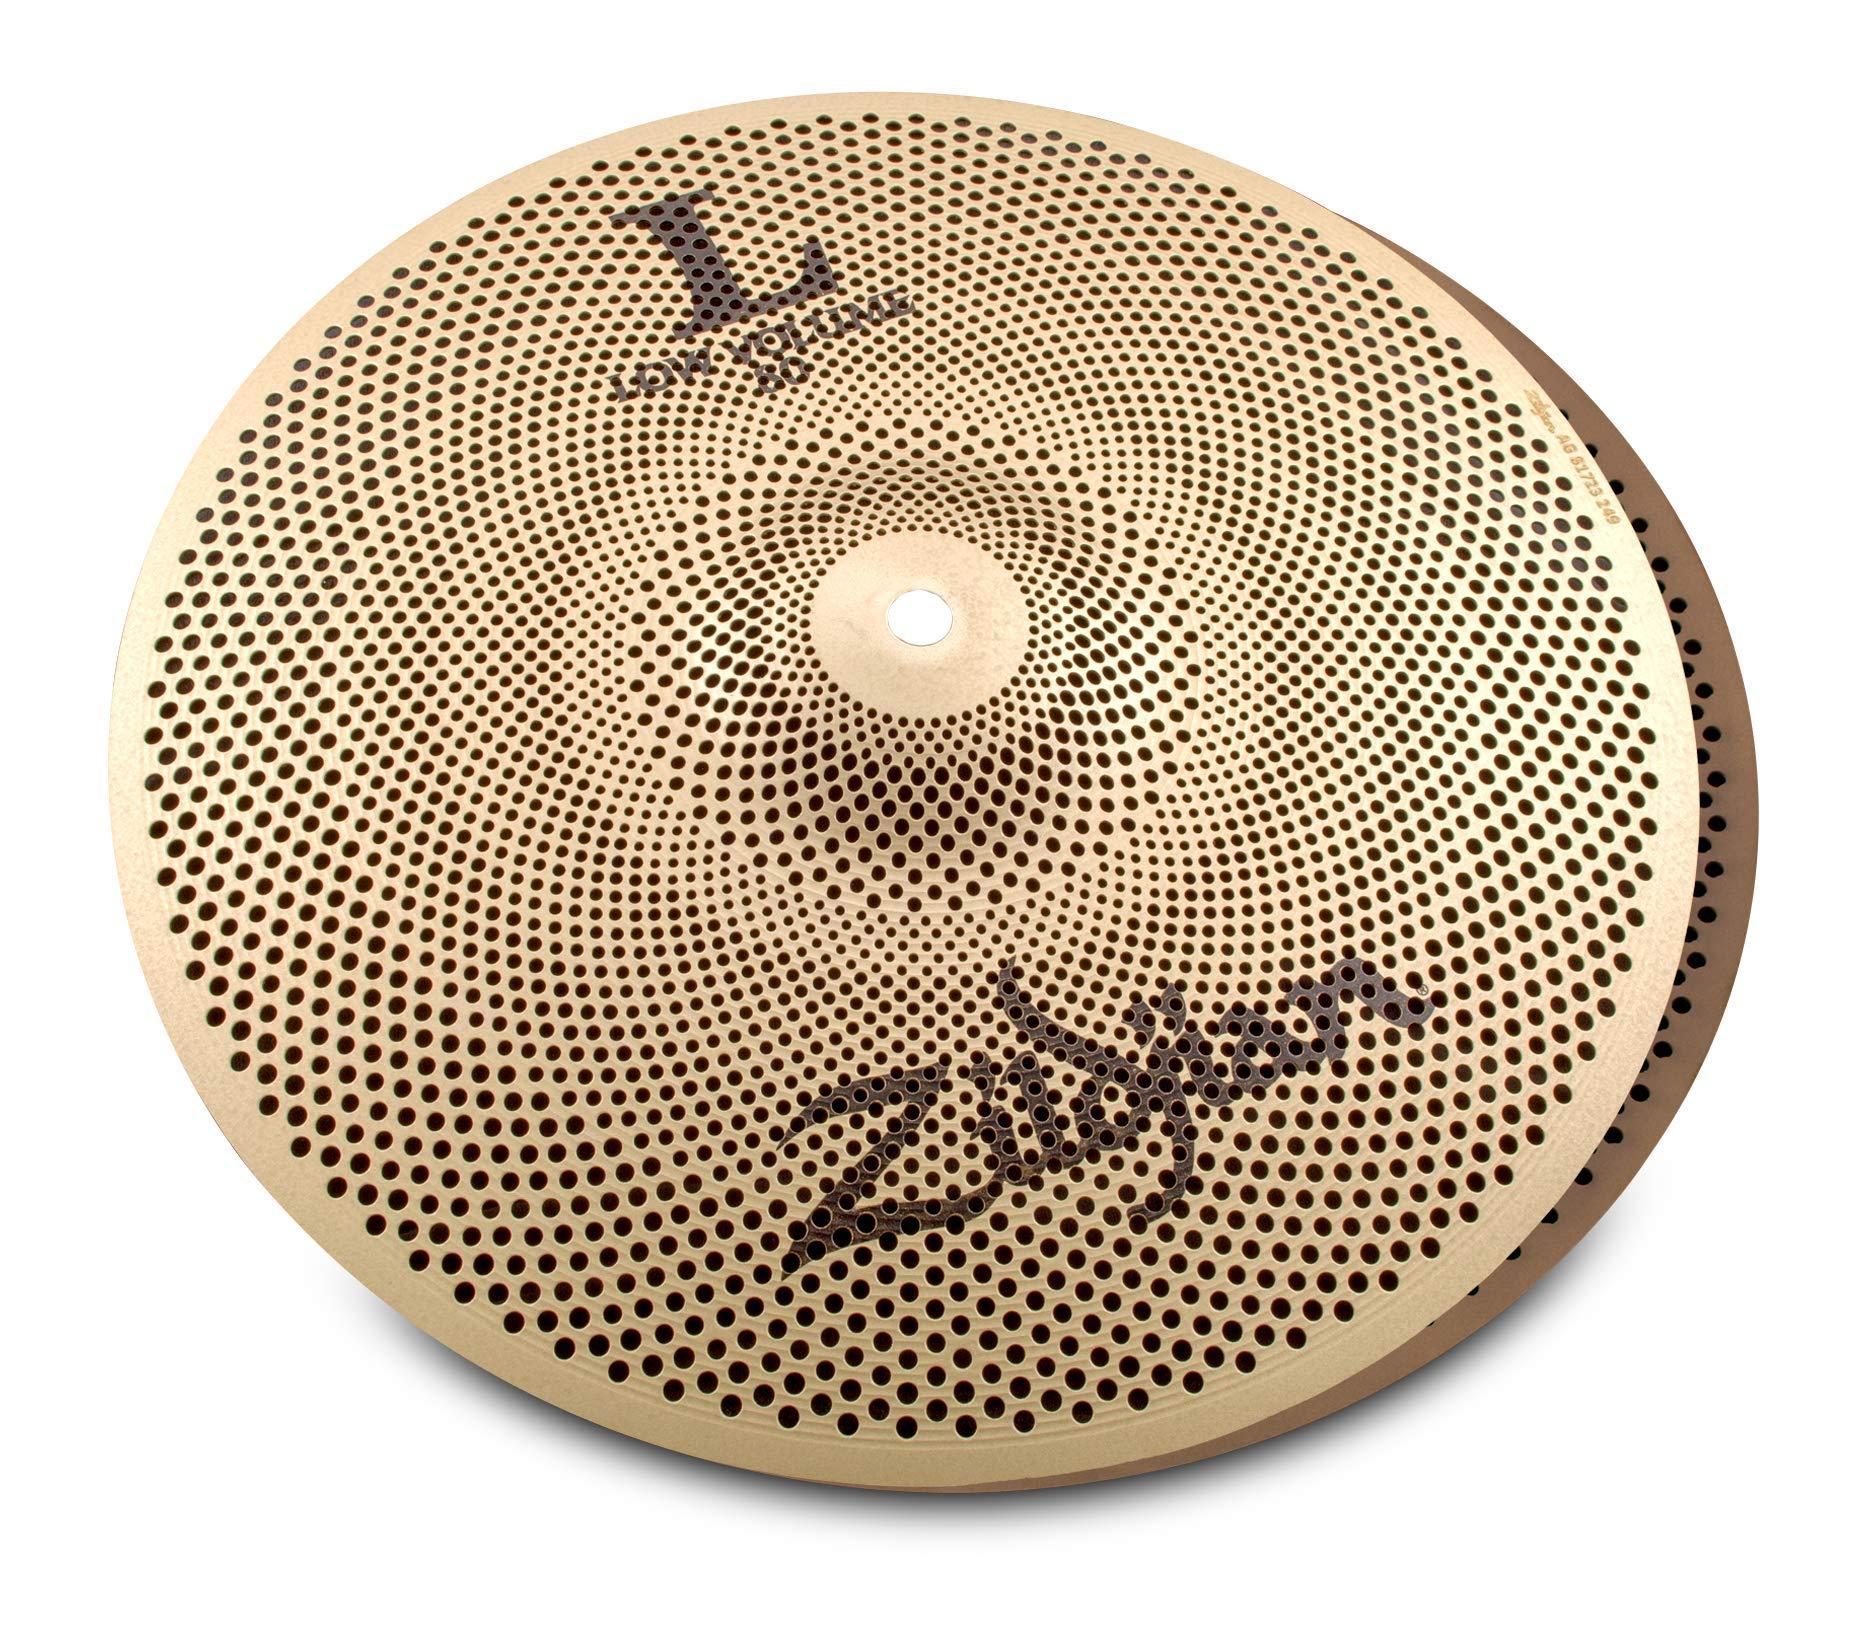 Zildjian Hi-Hat Cymbals (LV8013HP-S)